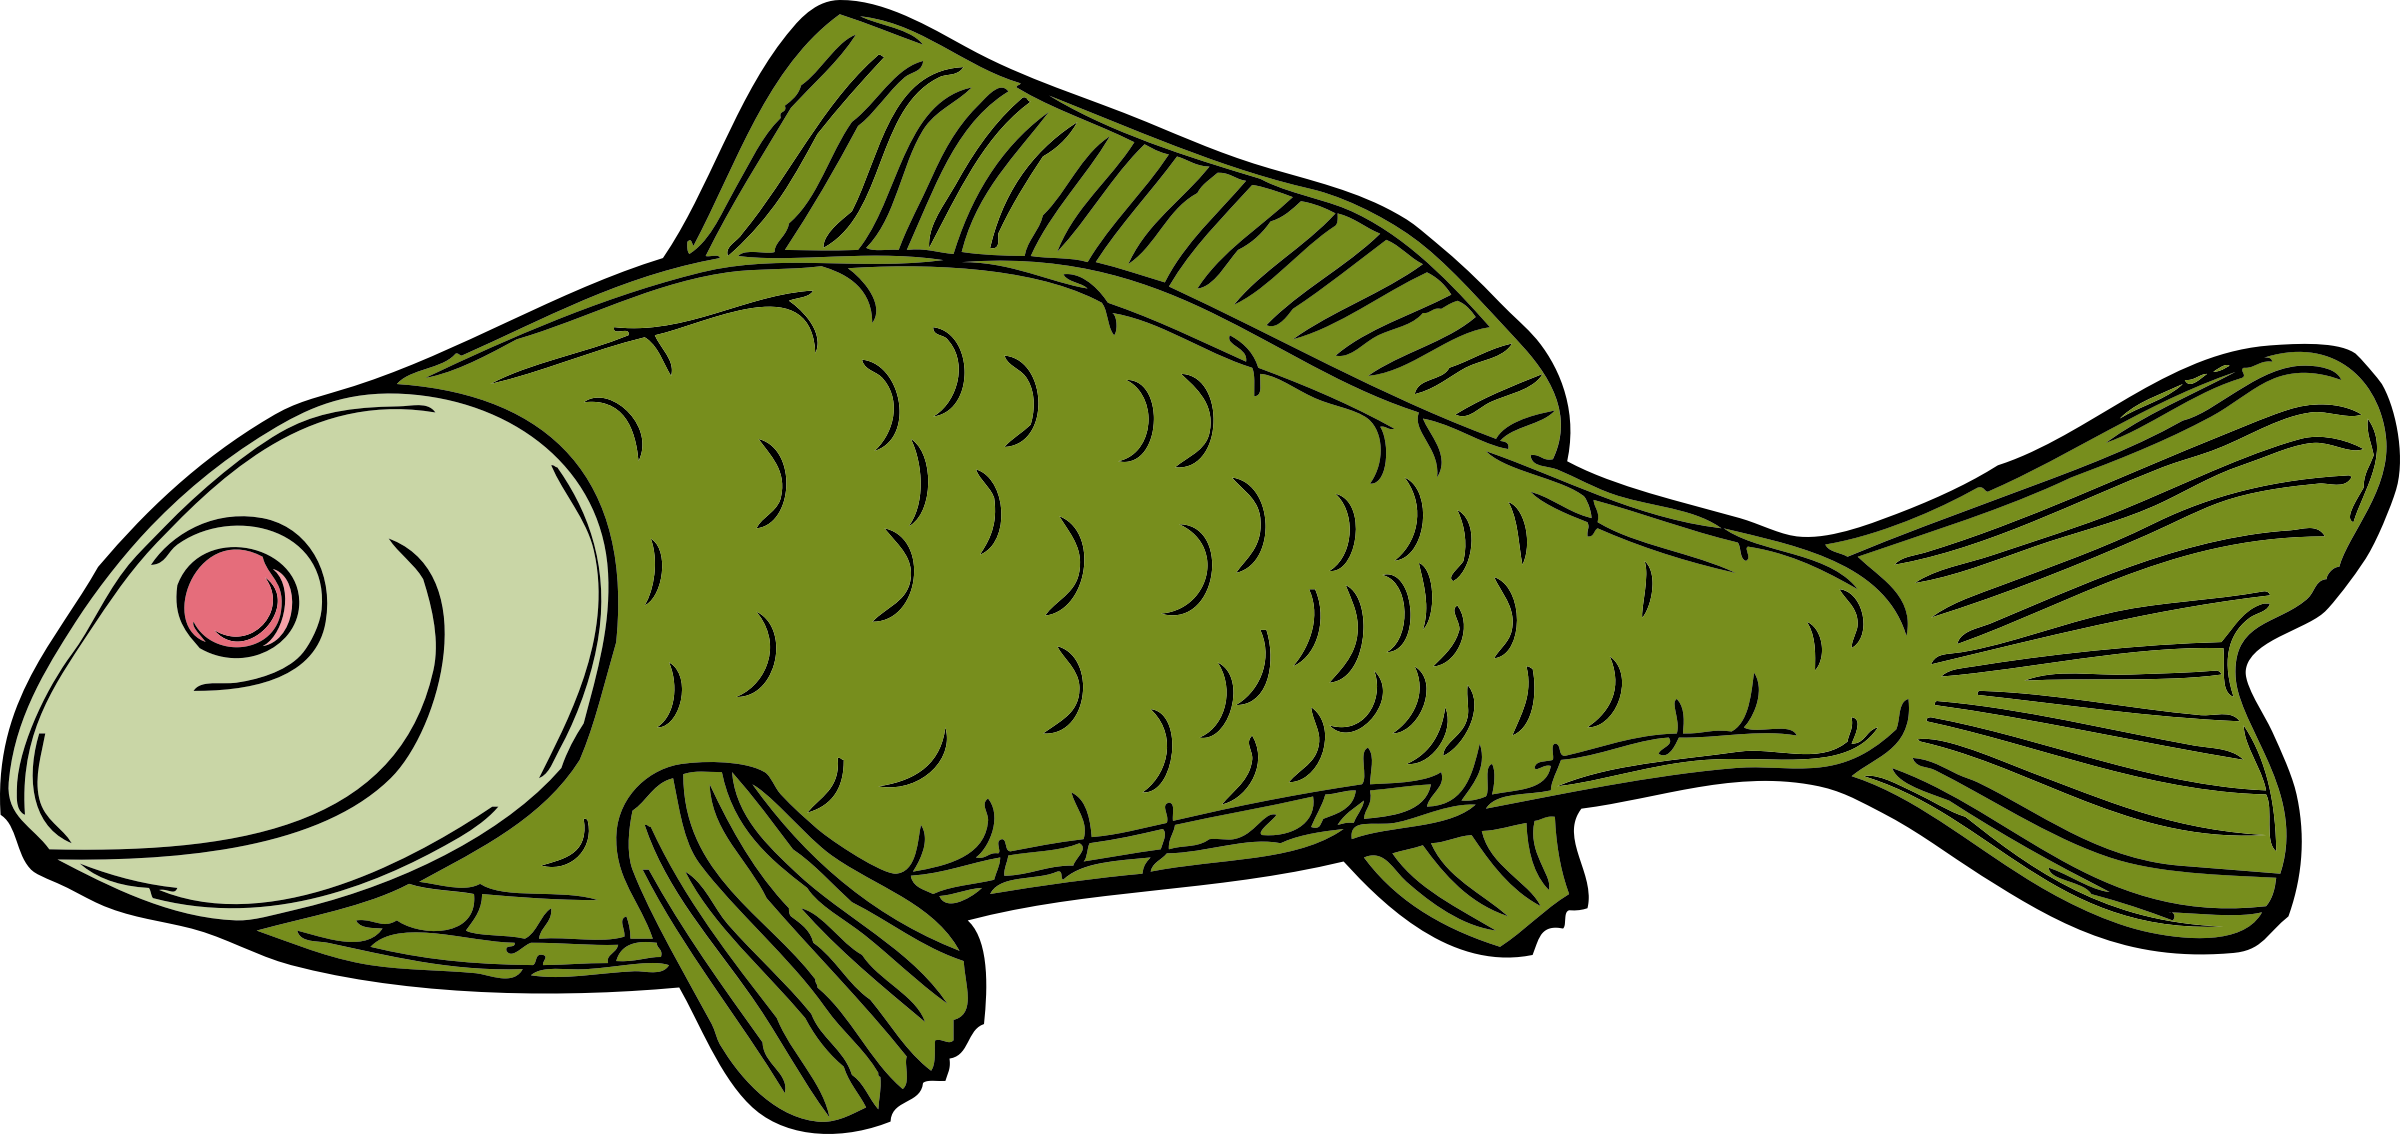 Fins clipart green fish Fish fish Clipart green green